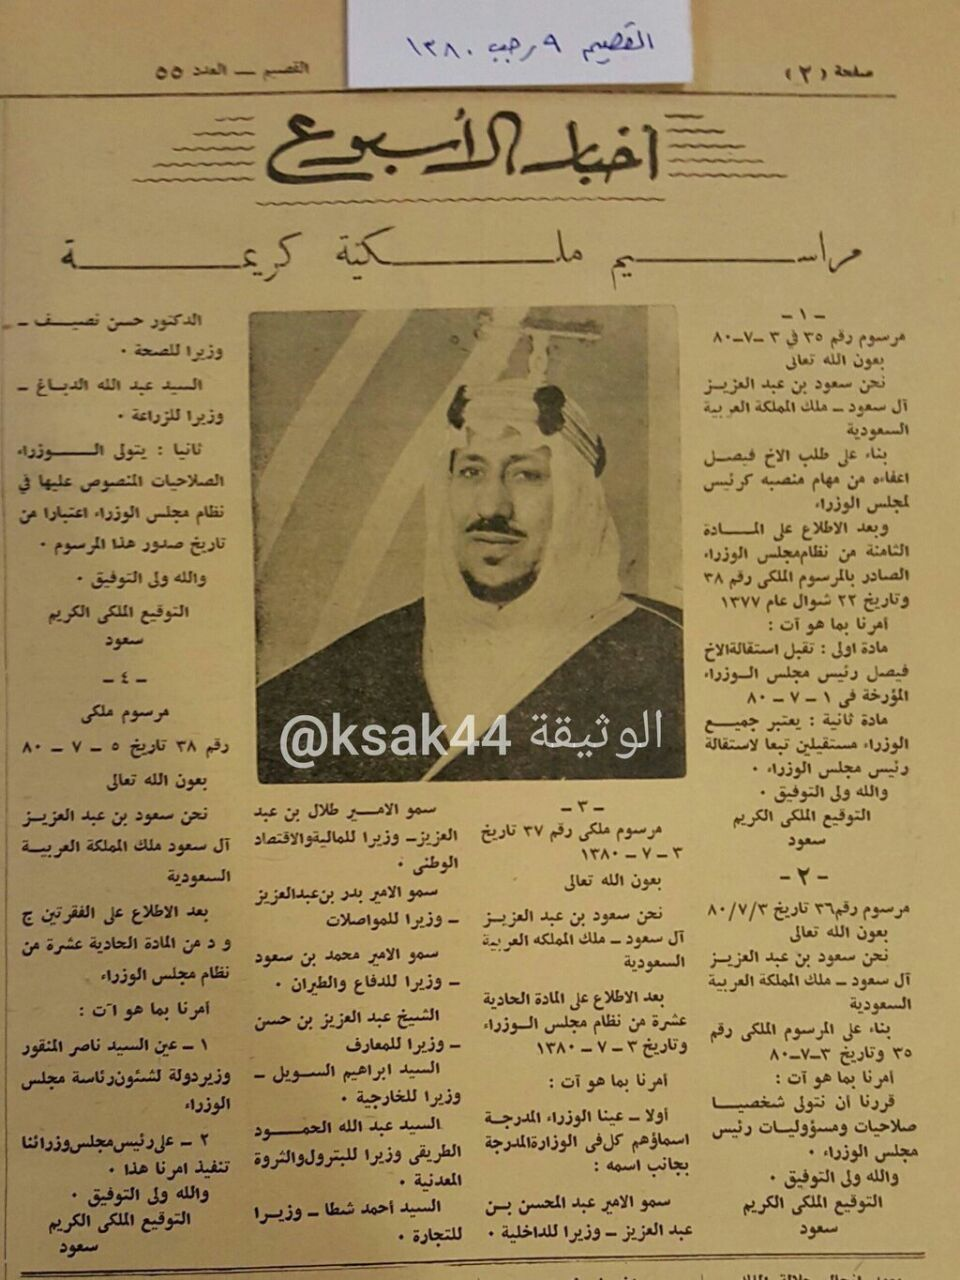 Pin By Jiji On King Saud Ben Abdulaziz Vintage Photographs Photographer Event Ticket